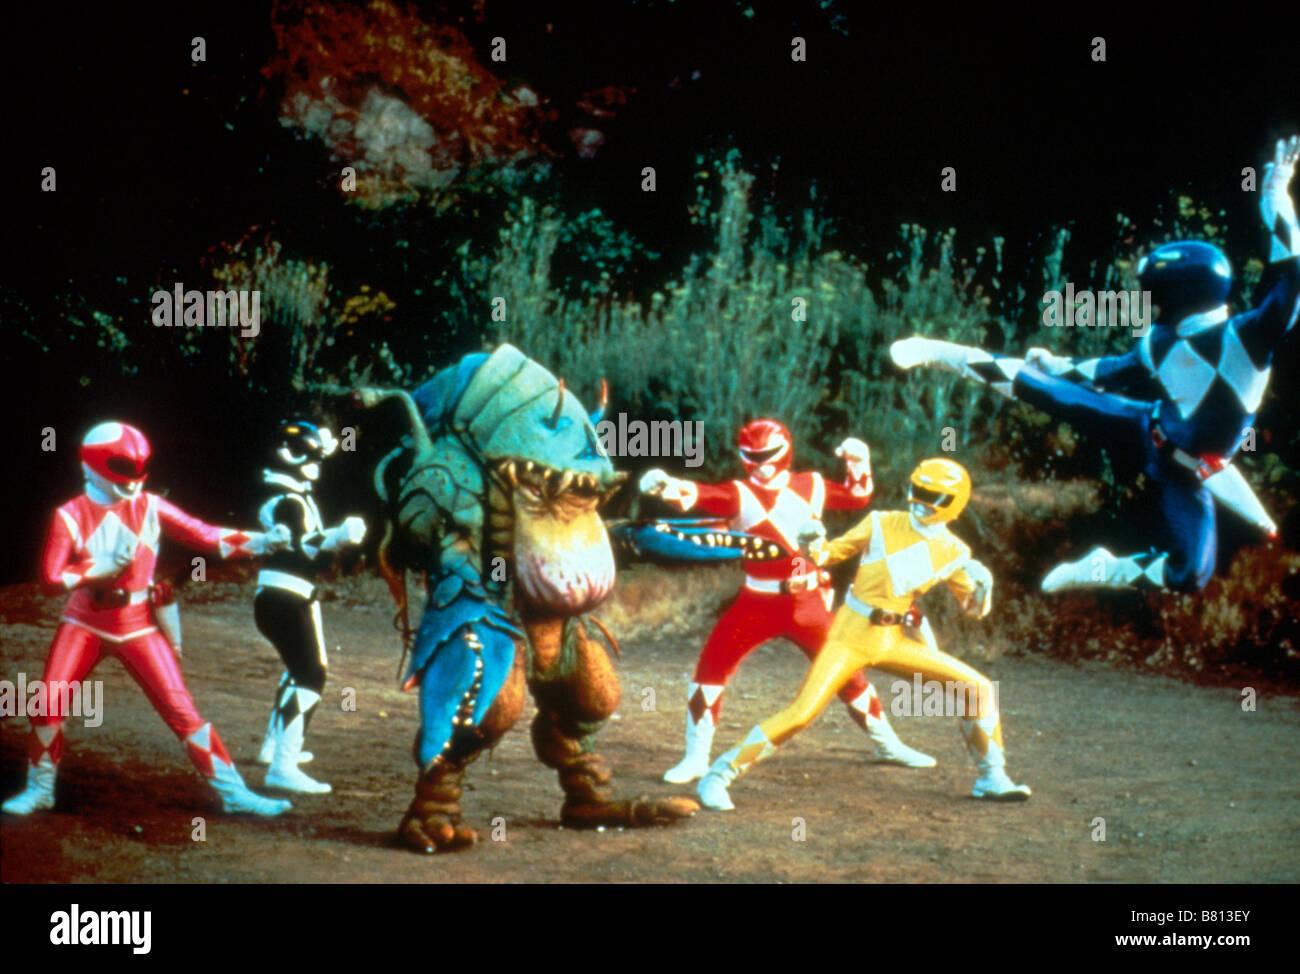 Mighty Morphin' Power Rangers  TV-Series 1993-1996 USA / Japan Director: John Blizek David Blyth - Stock Image